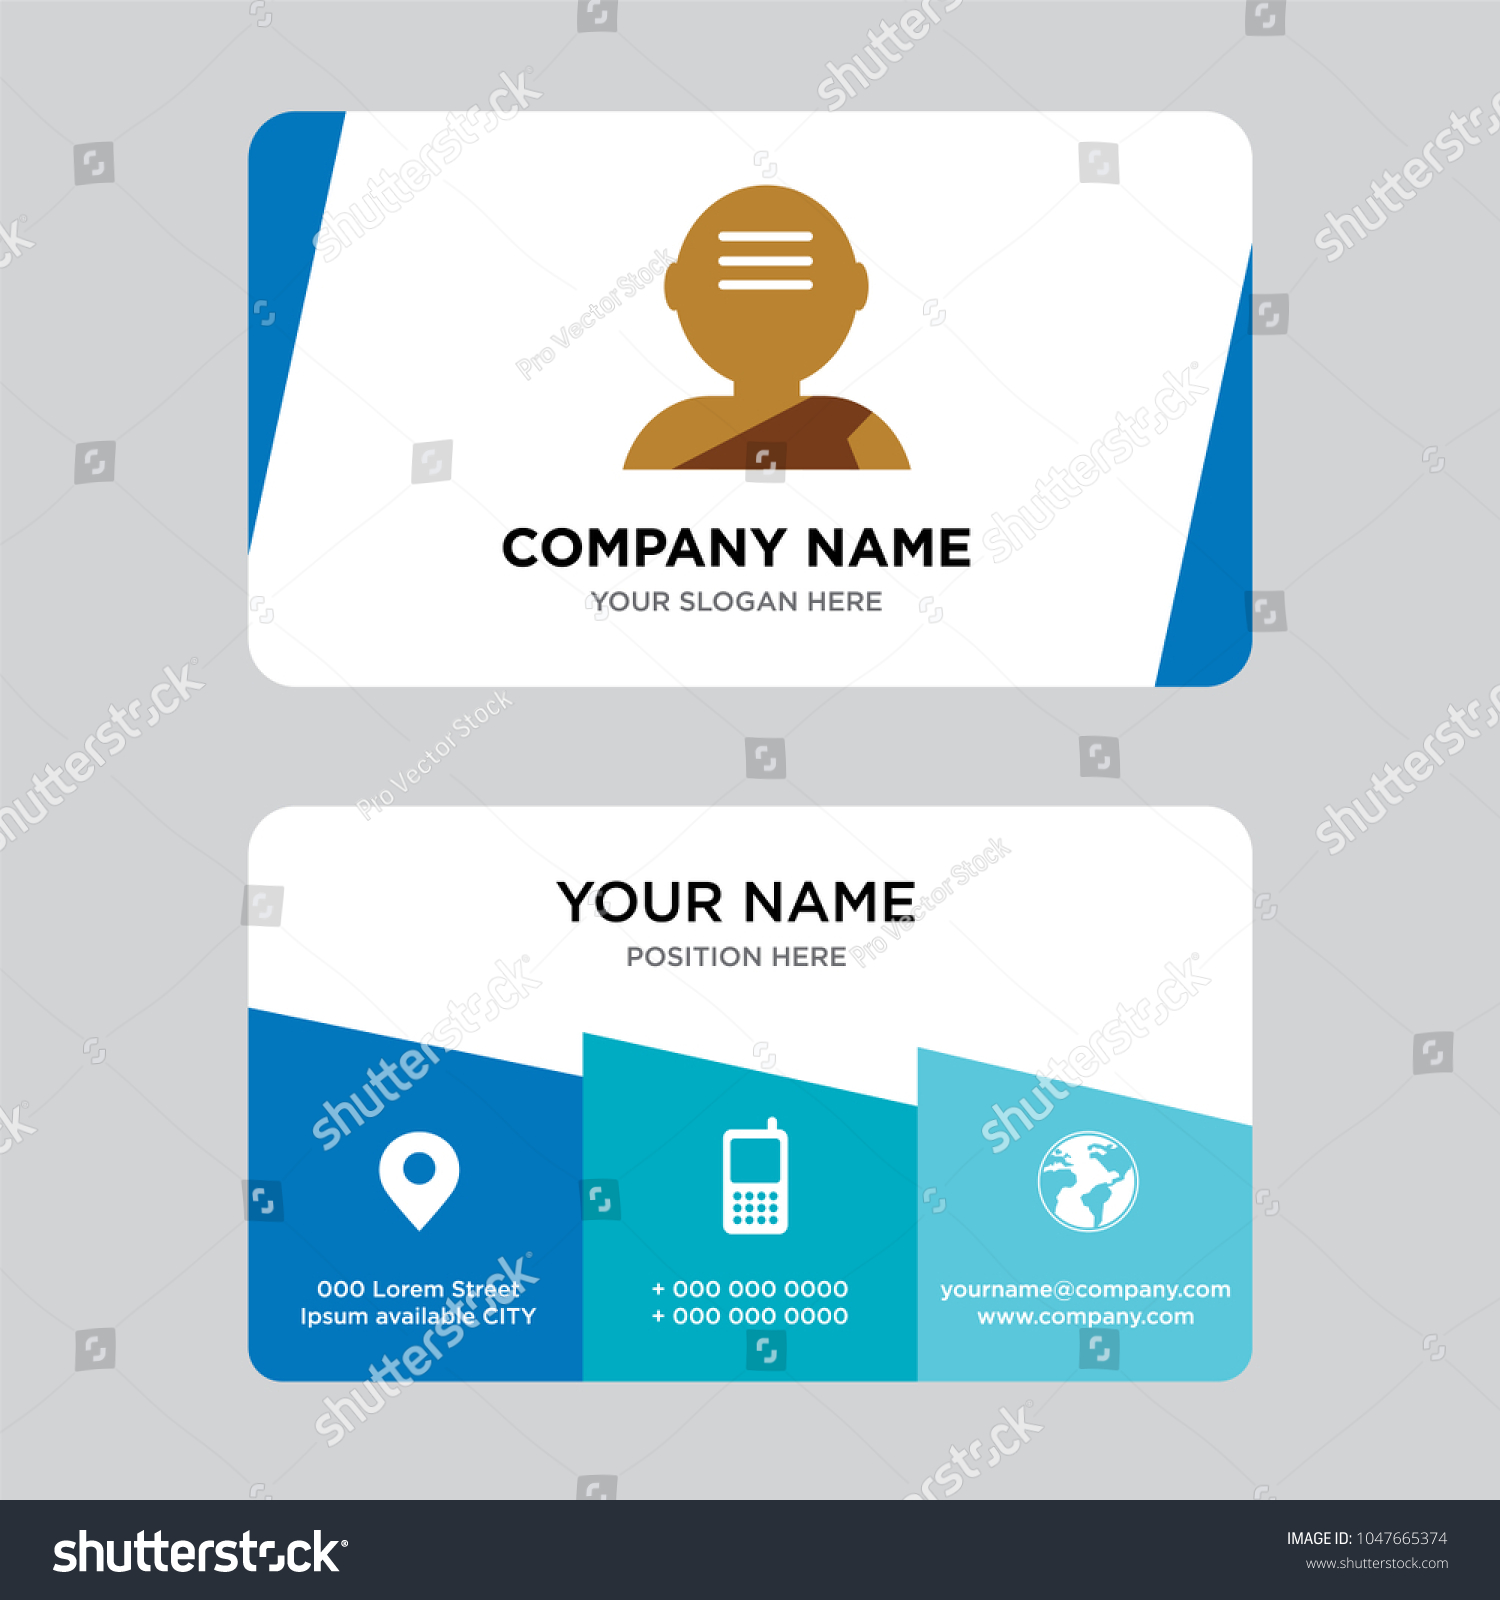 Pandit Business Card Design Template Visiting Stock Photo (Photo ...